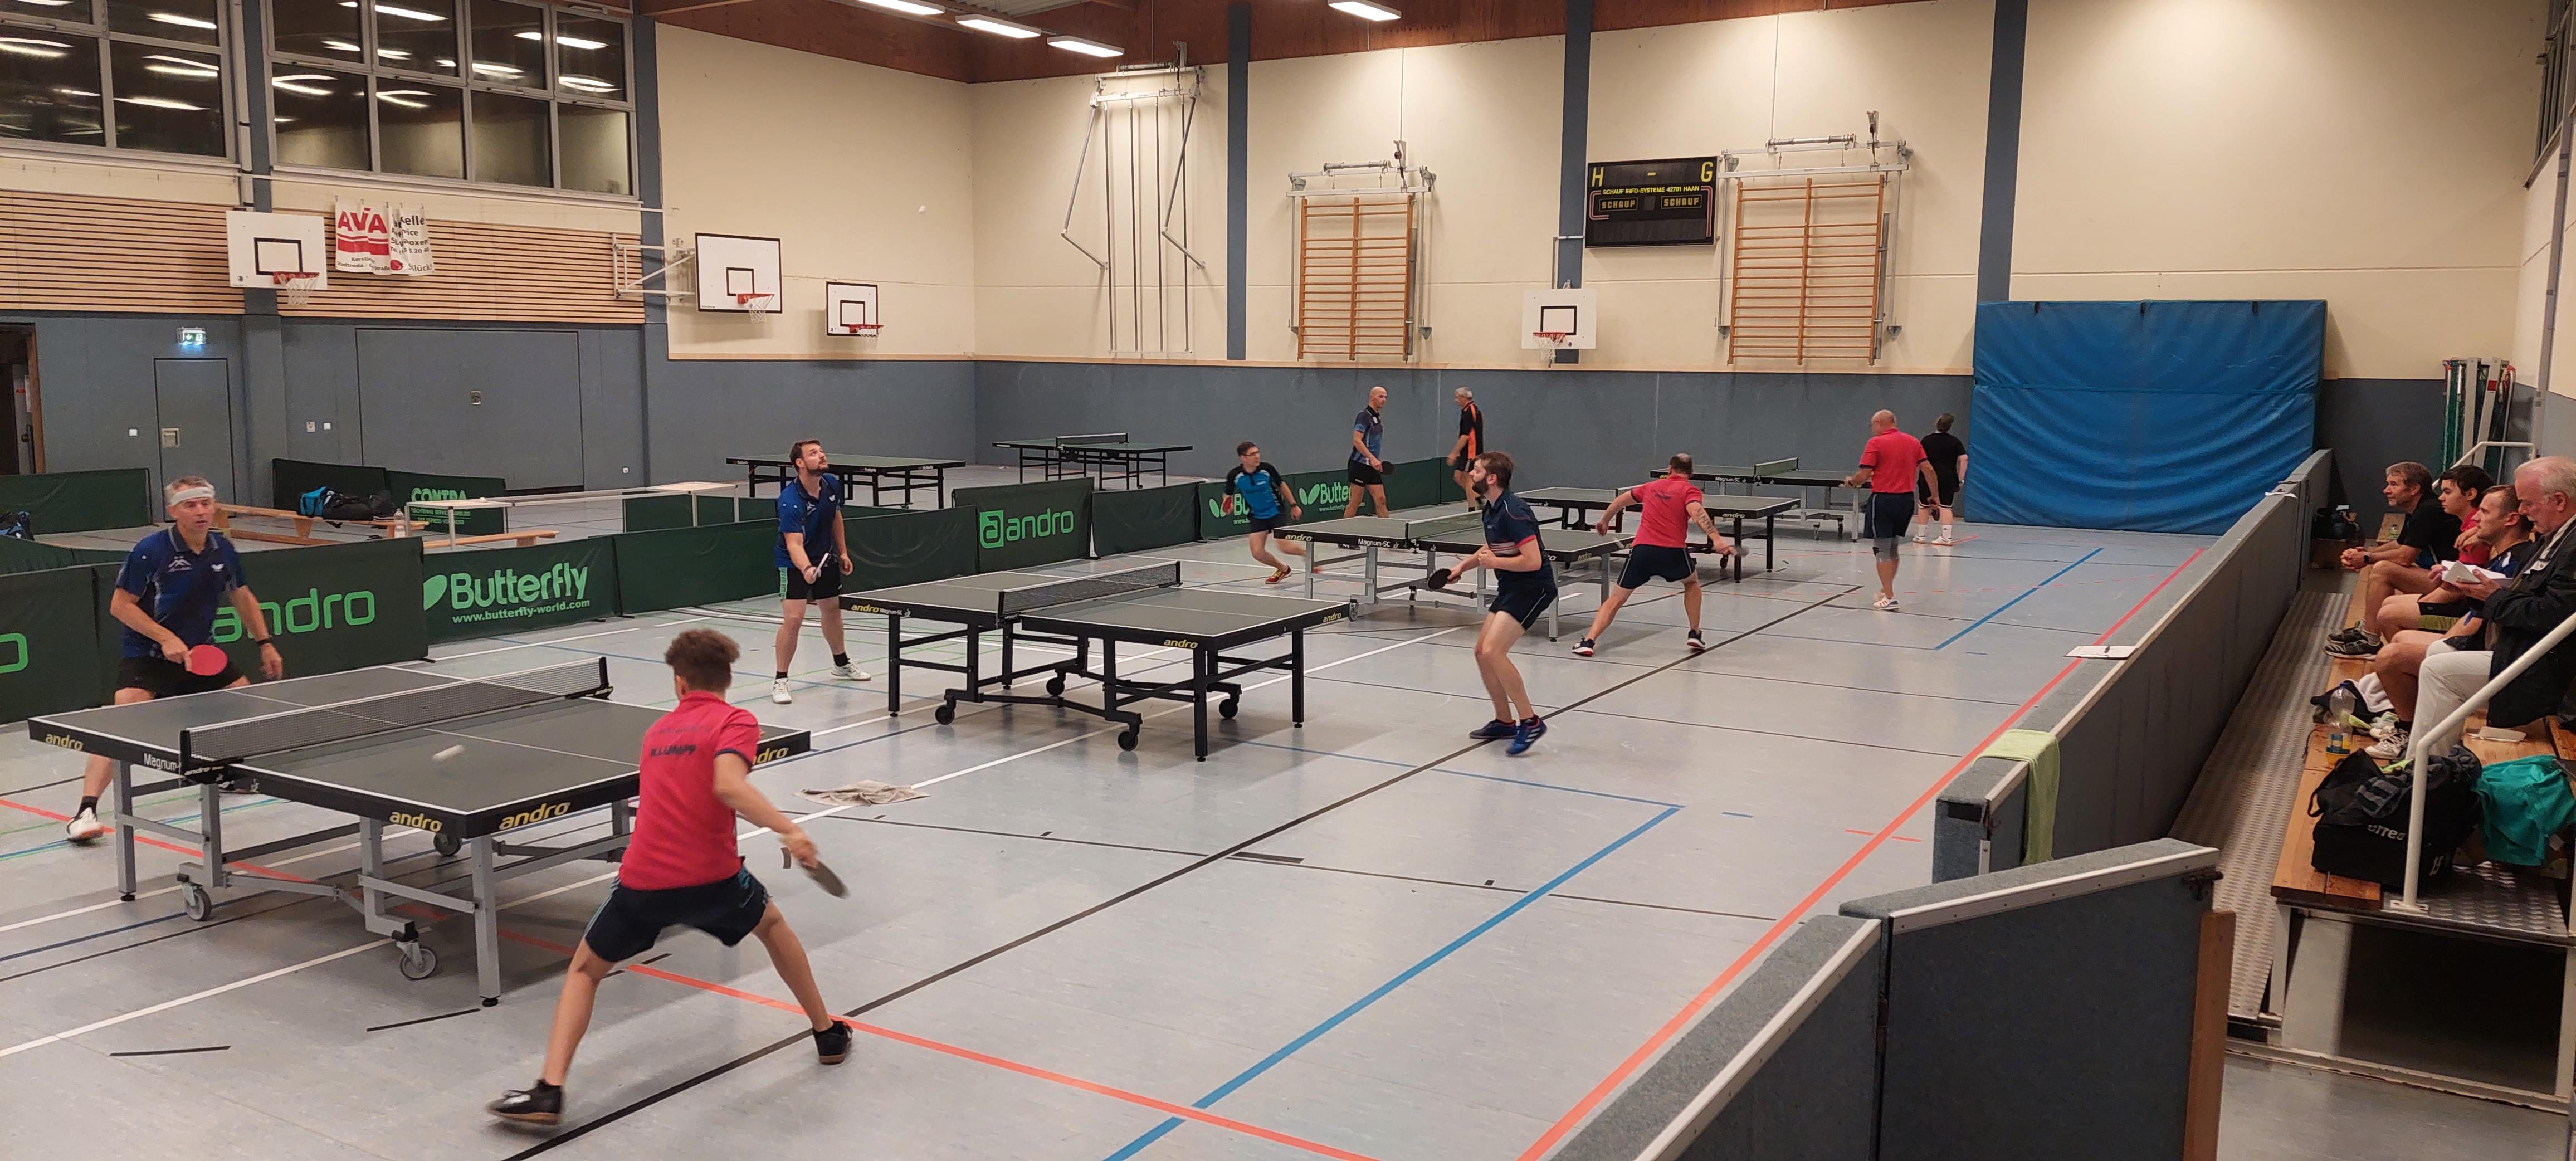 Testspiel in Stadtroda